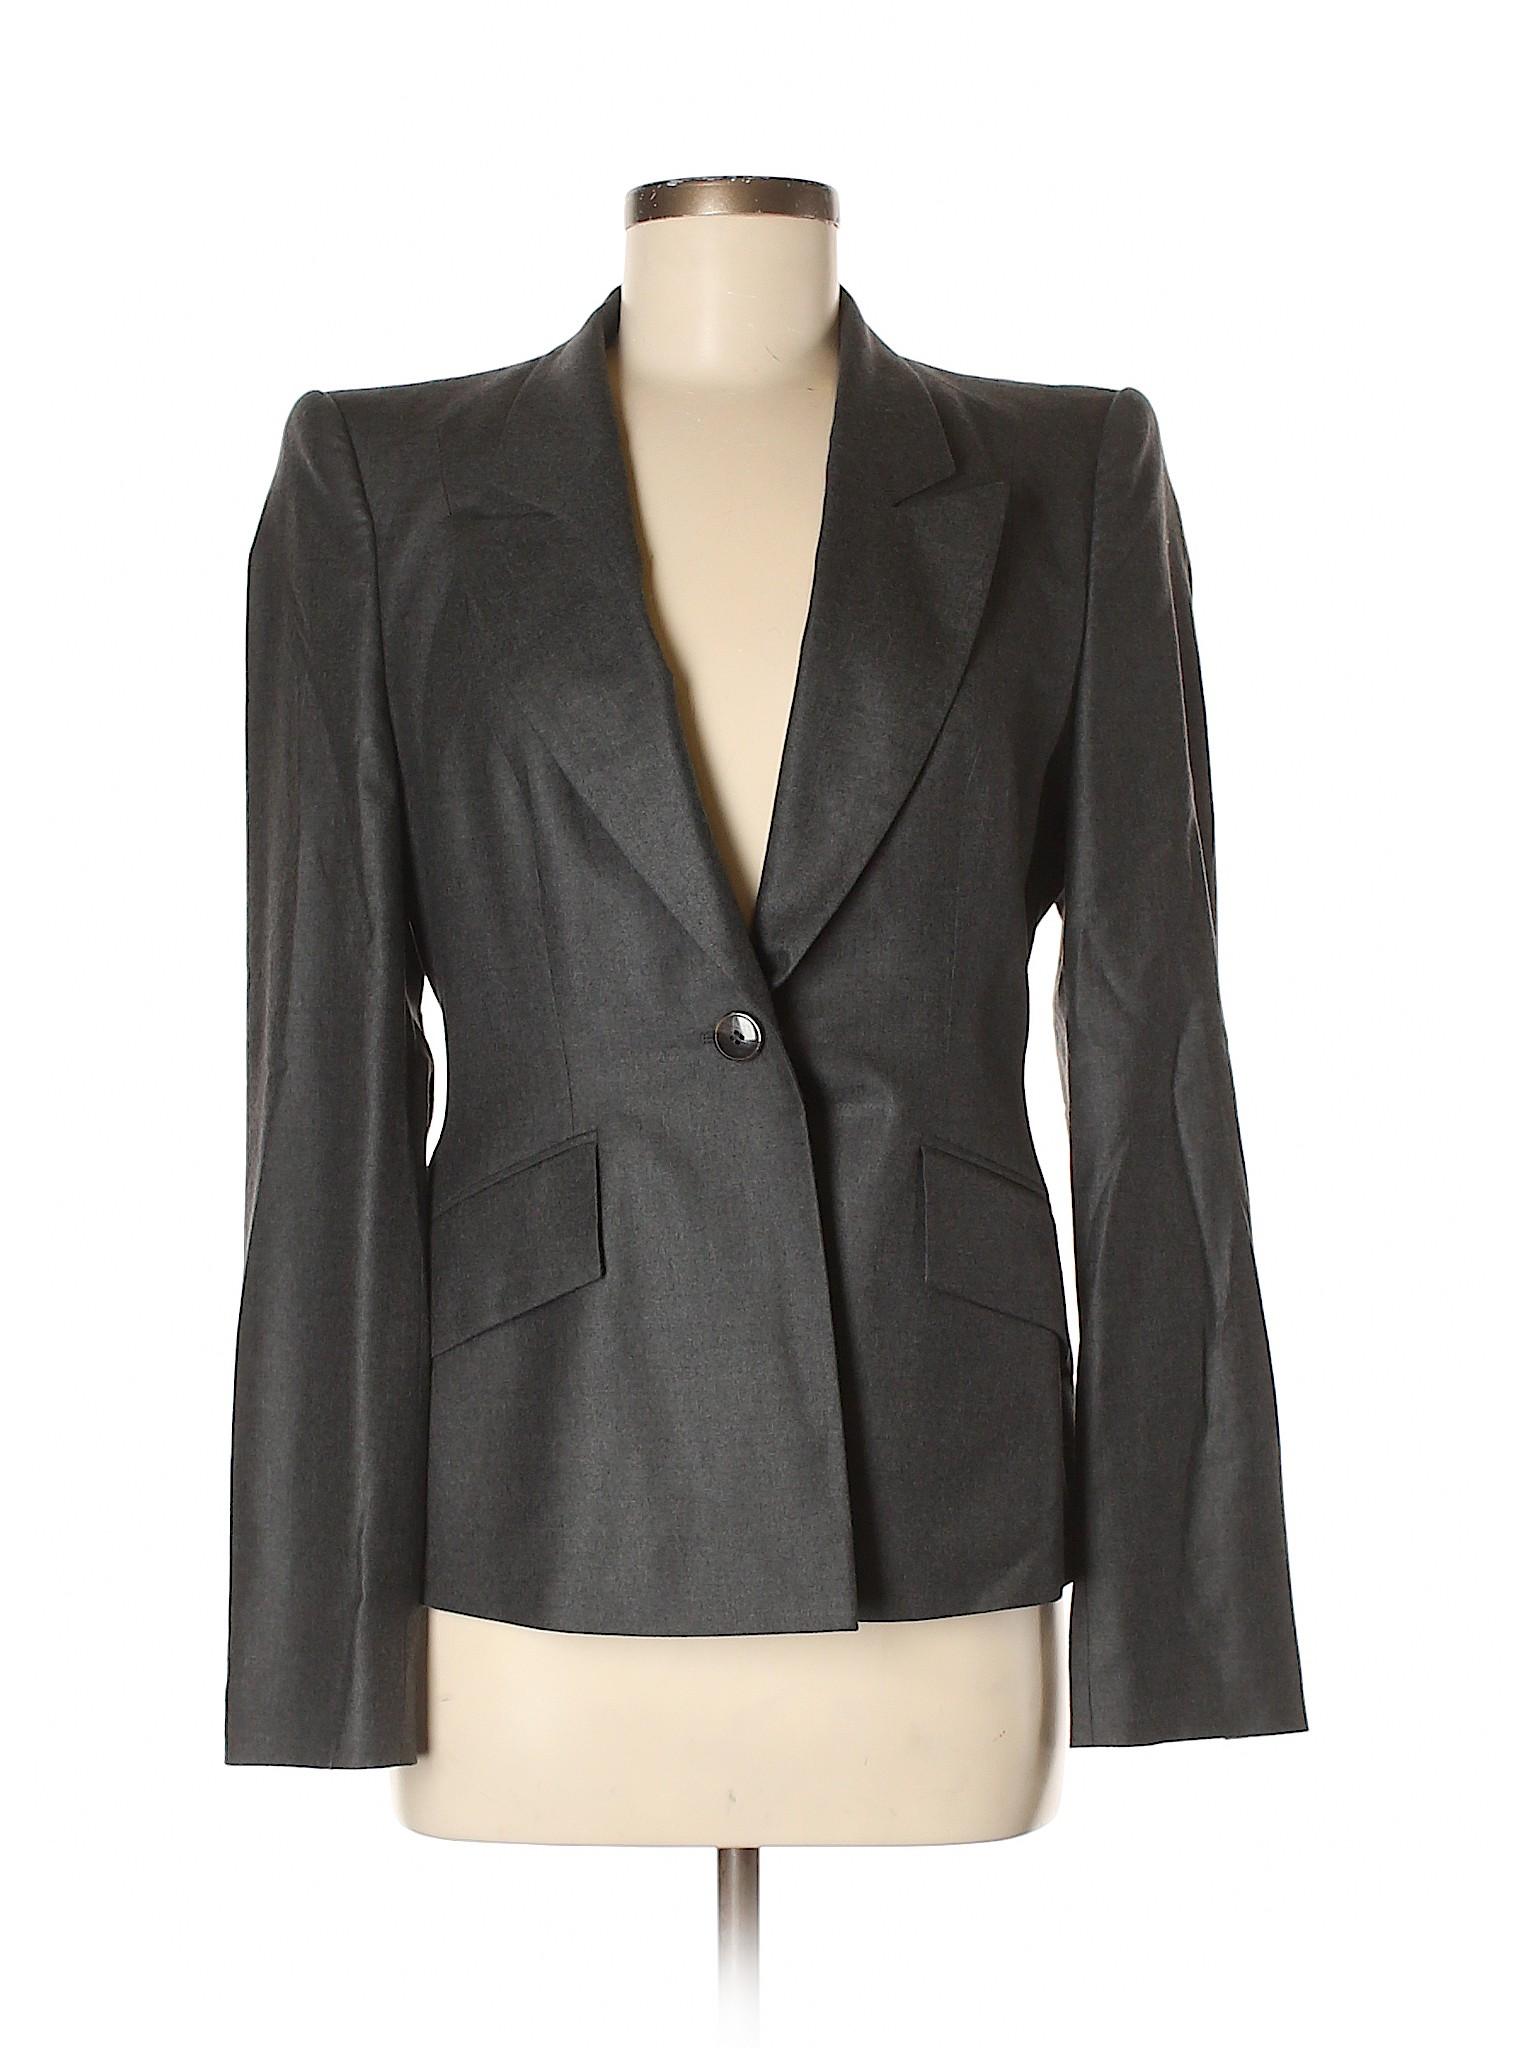 leisure Wool Boutique by BOSS HUGO Blazer BOSS aBn4qdg8